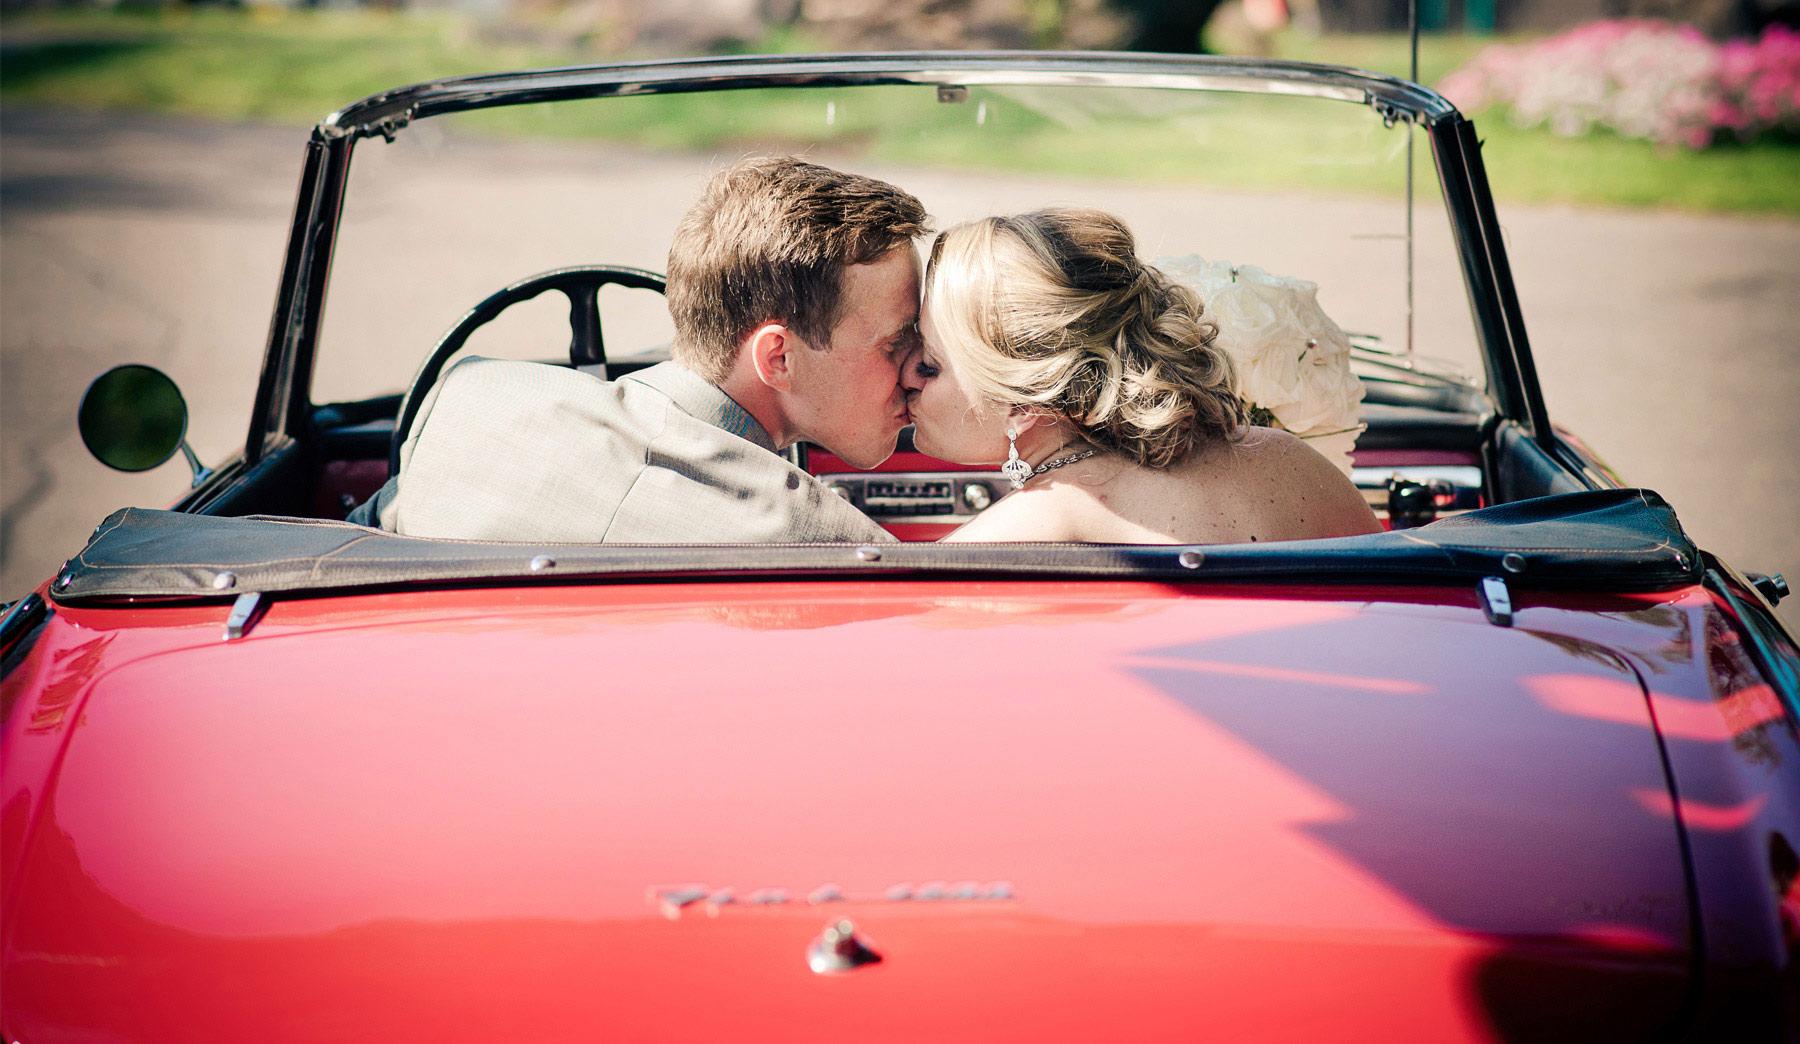 07-Brainerd-Minnesota-Wedding-Photography-by-Vick-Photography-Craguns-Resort-Convertable-Lucy-&-Matt.jpg